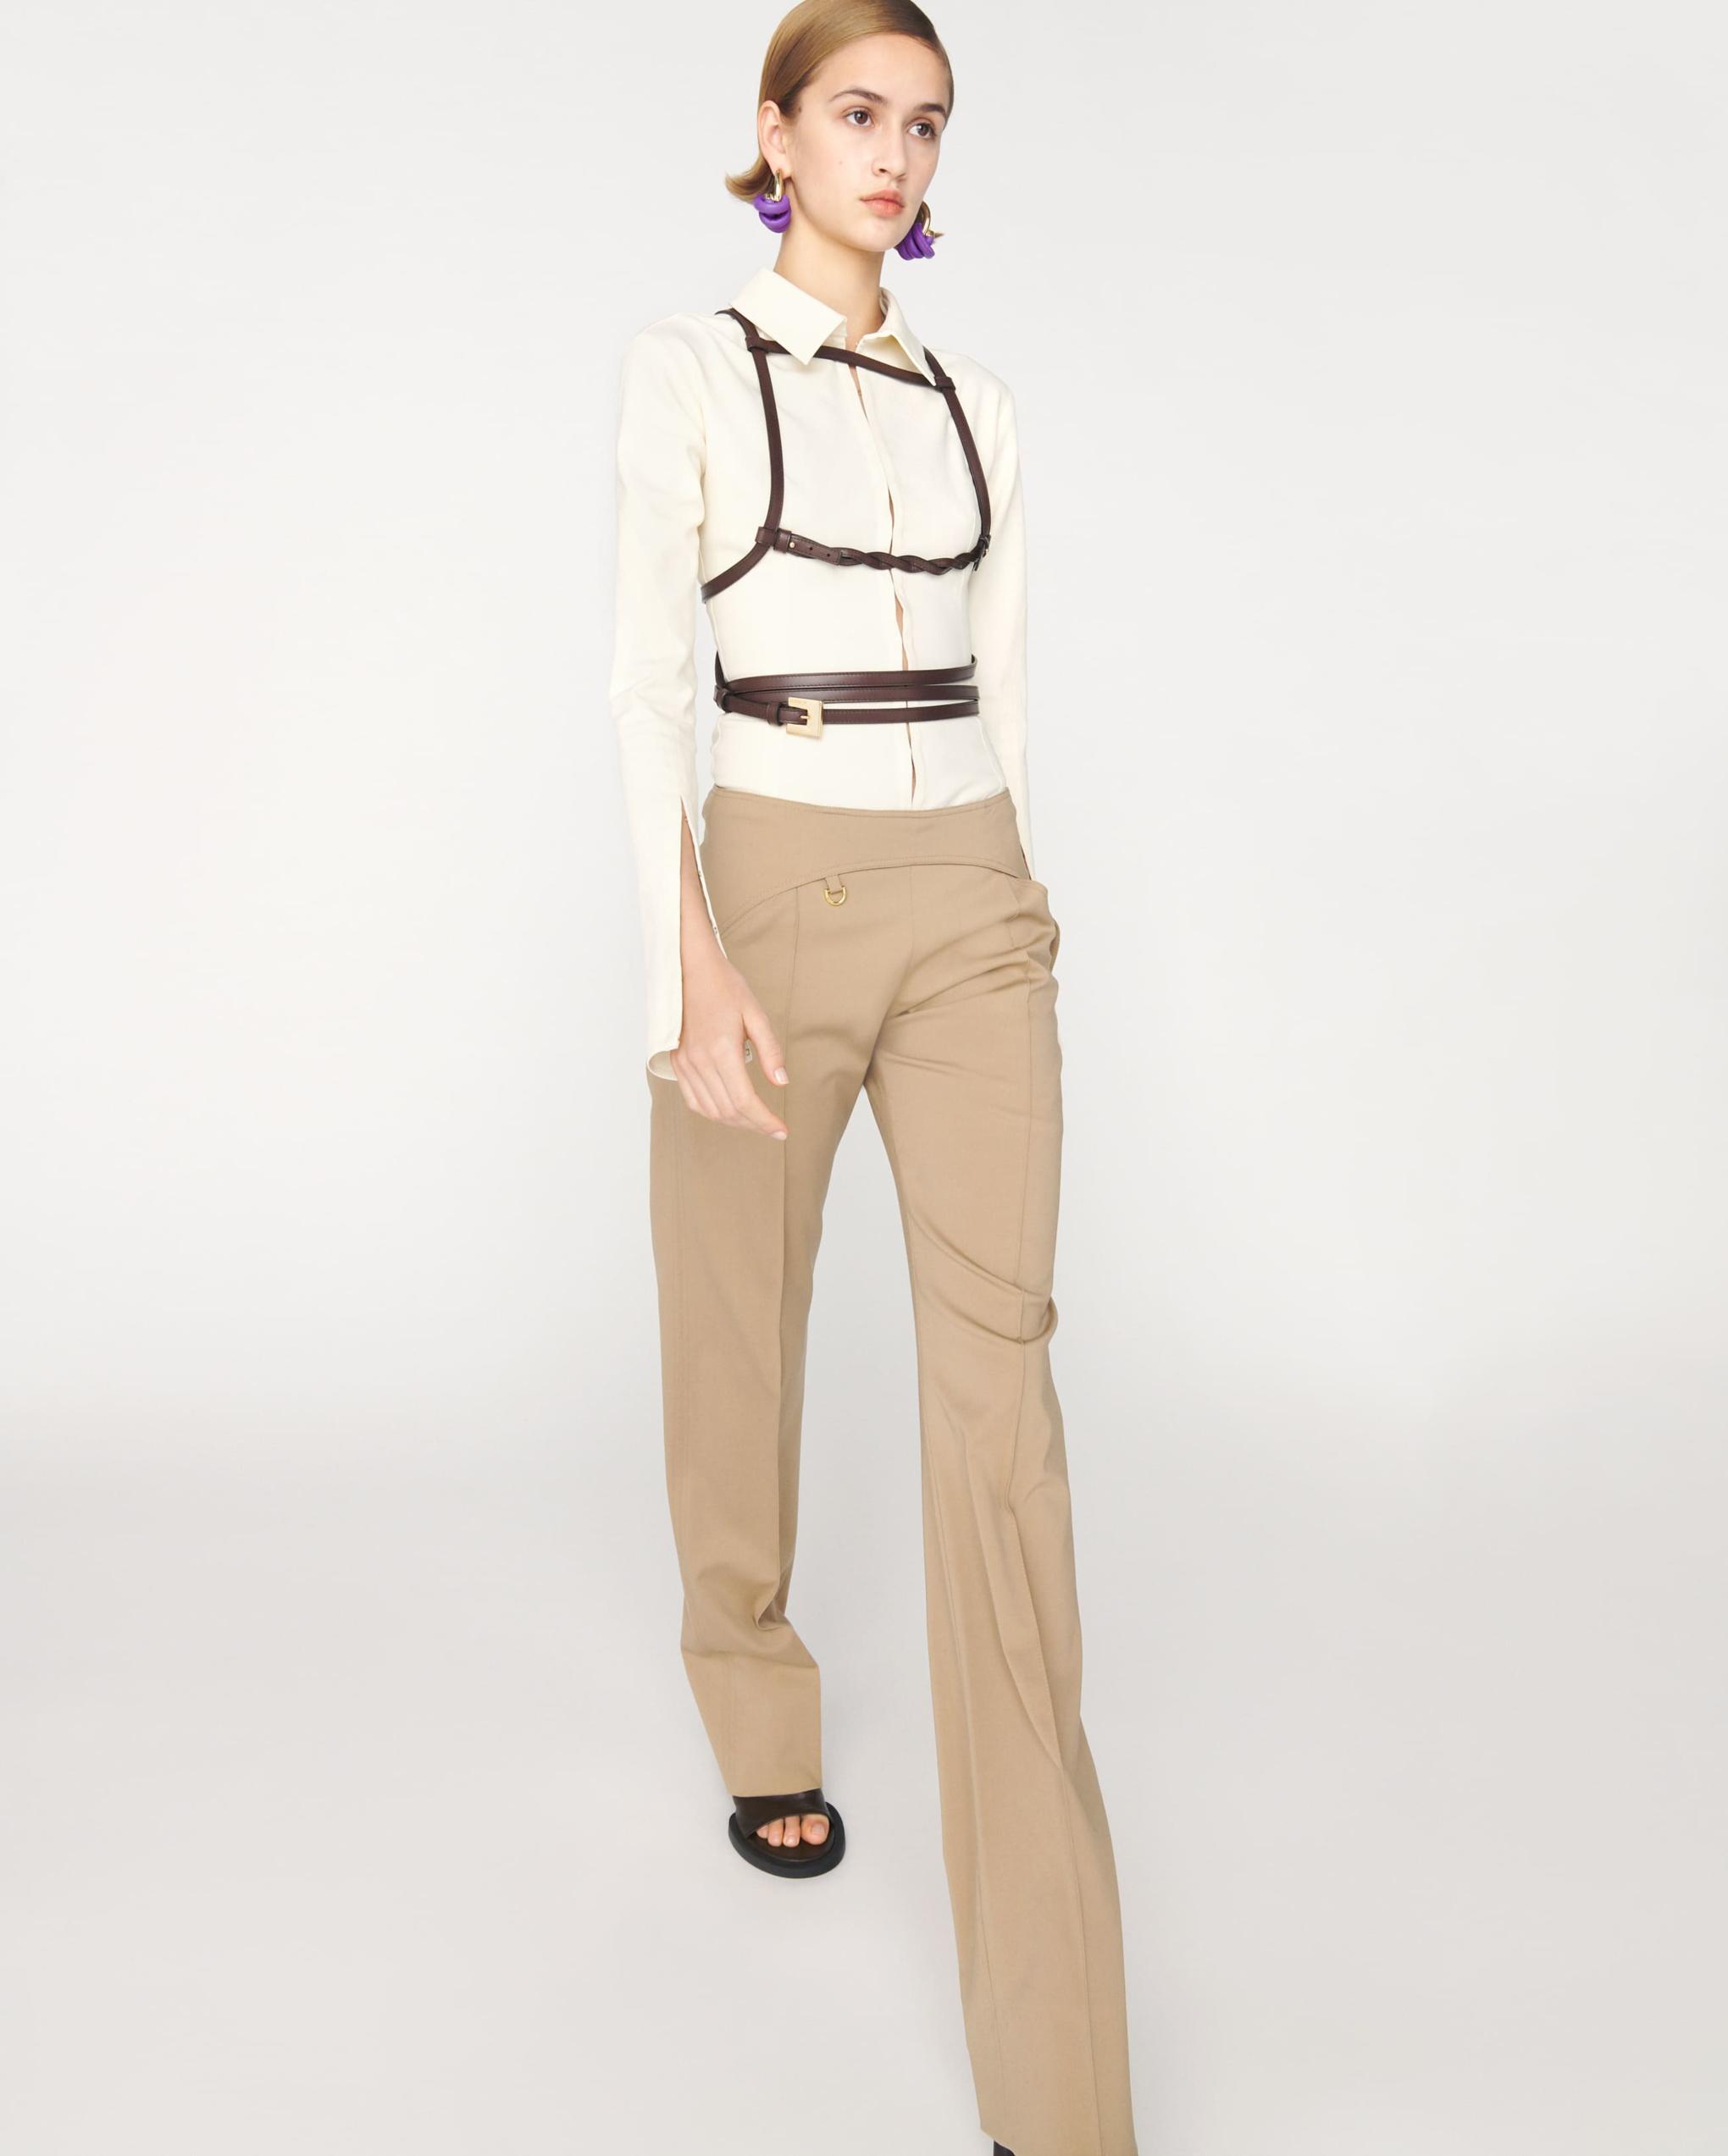 Le pantalon Draio